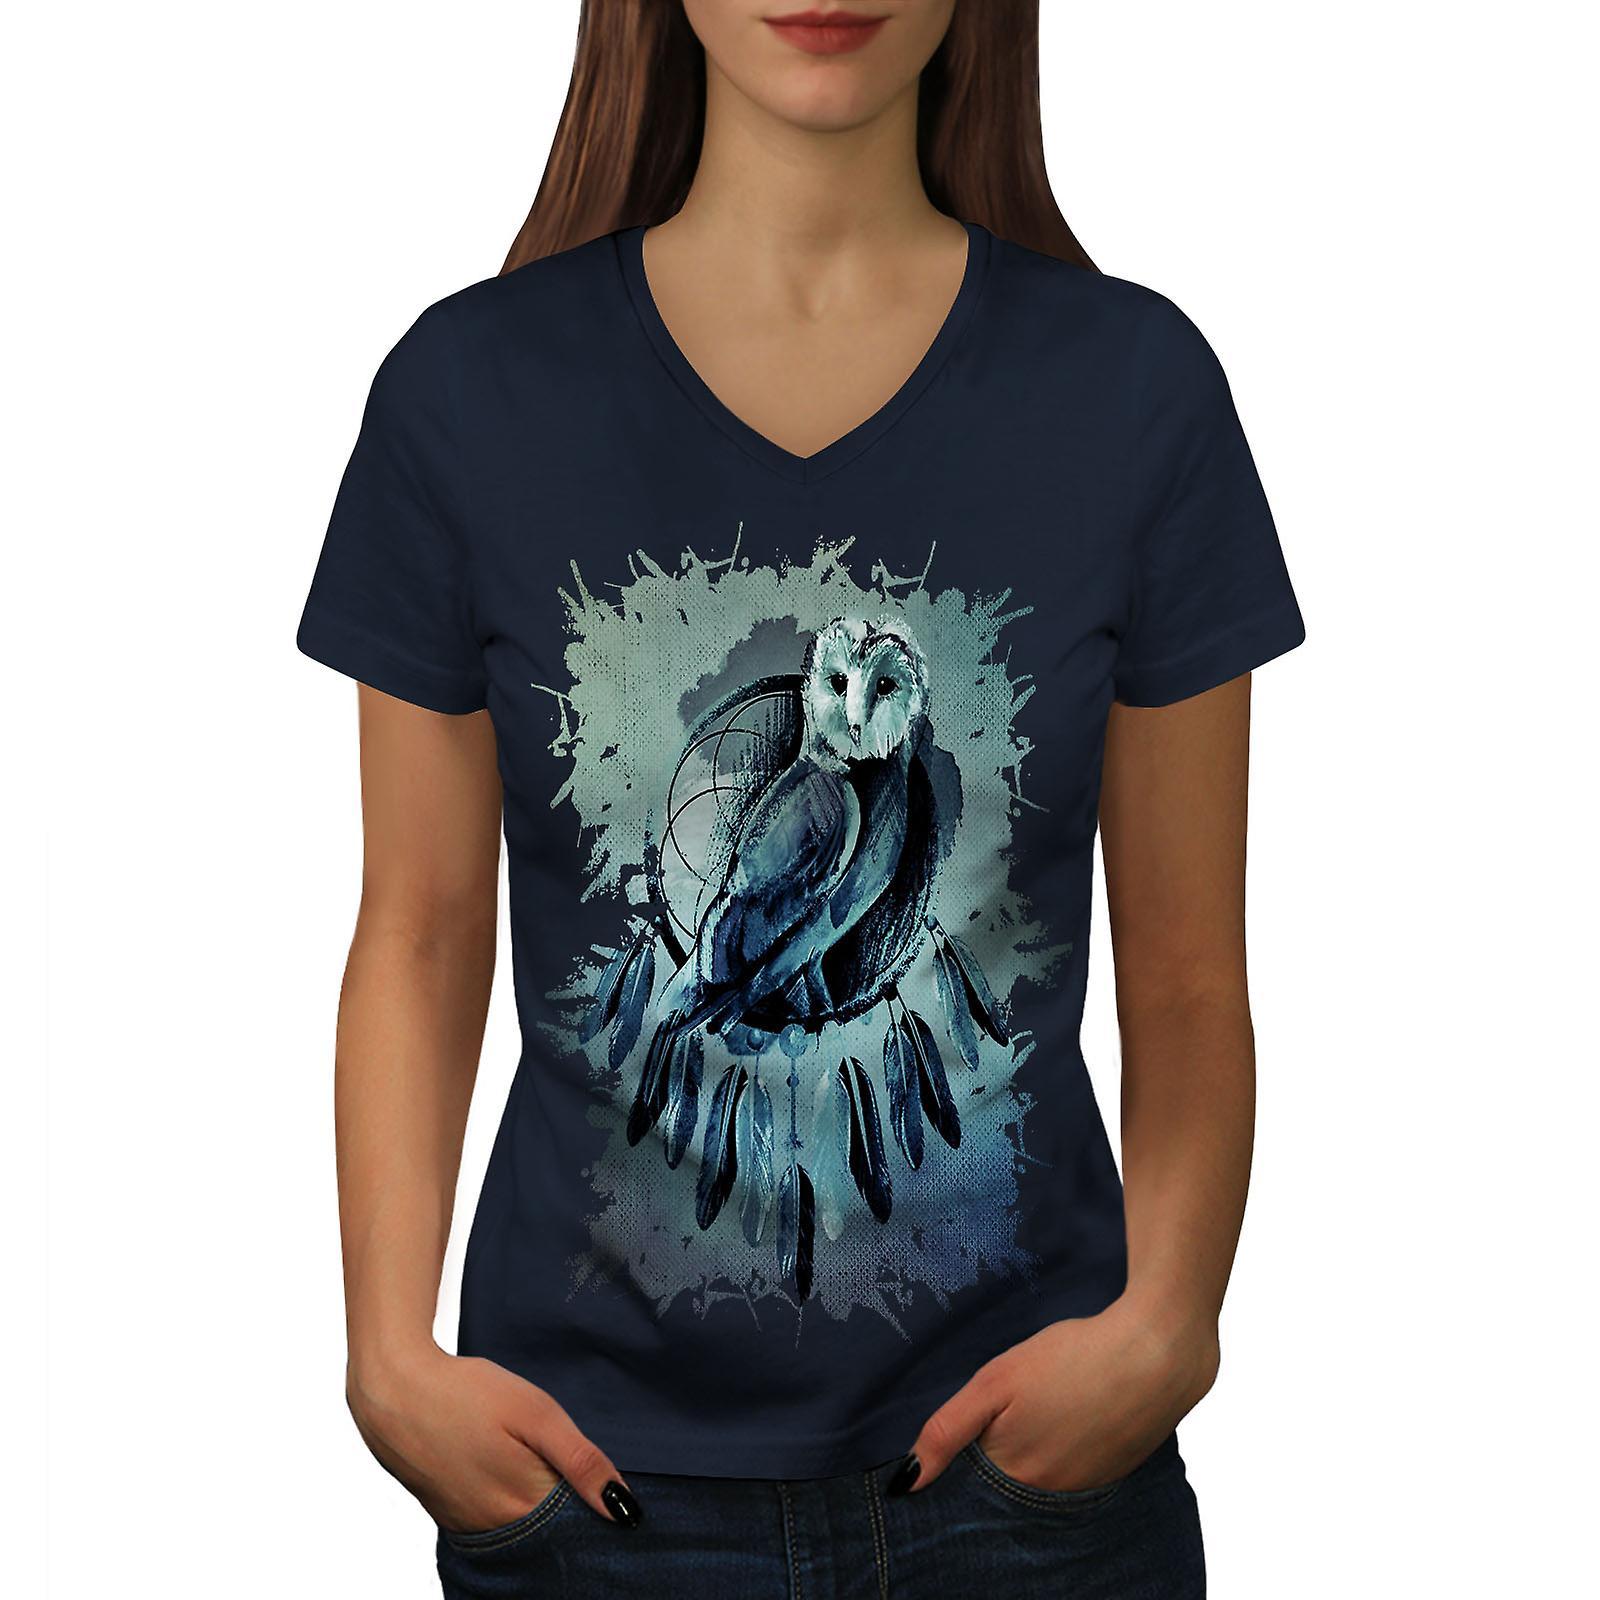 Hibou rêve bête Animal femmes NavyV-Neck T-shirt | Wellcoda